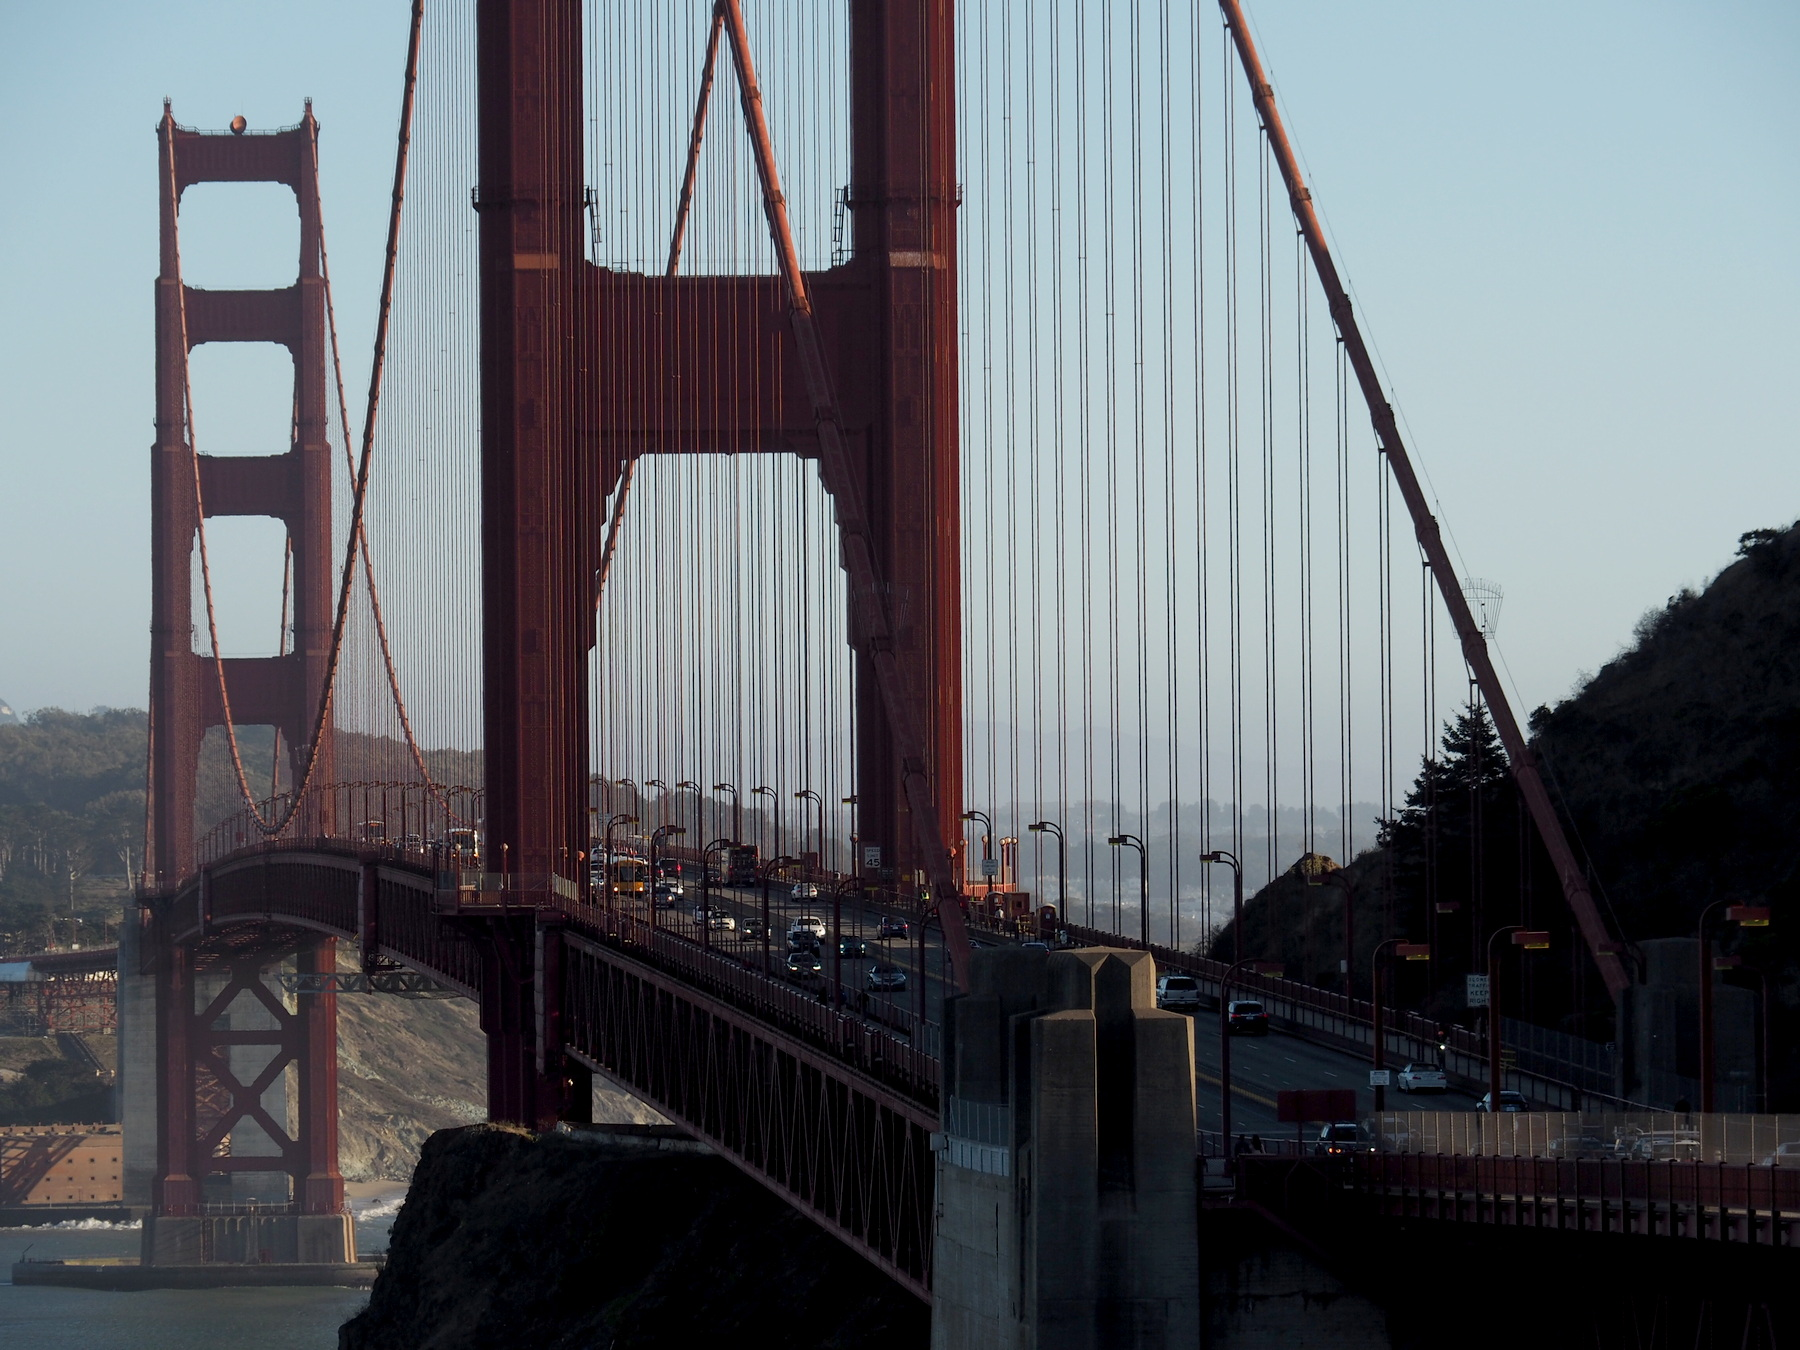 Golden Gate am Abend